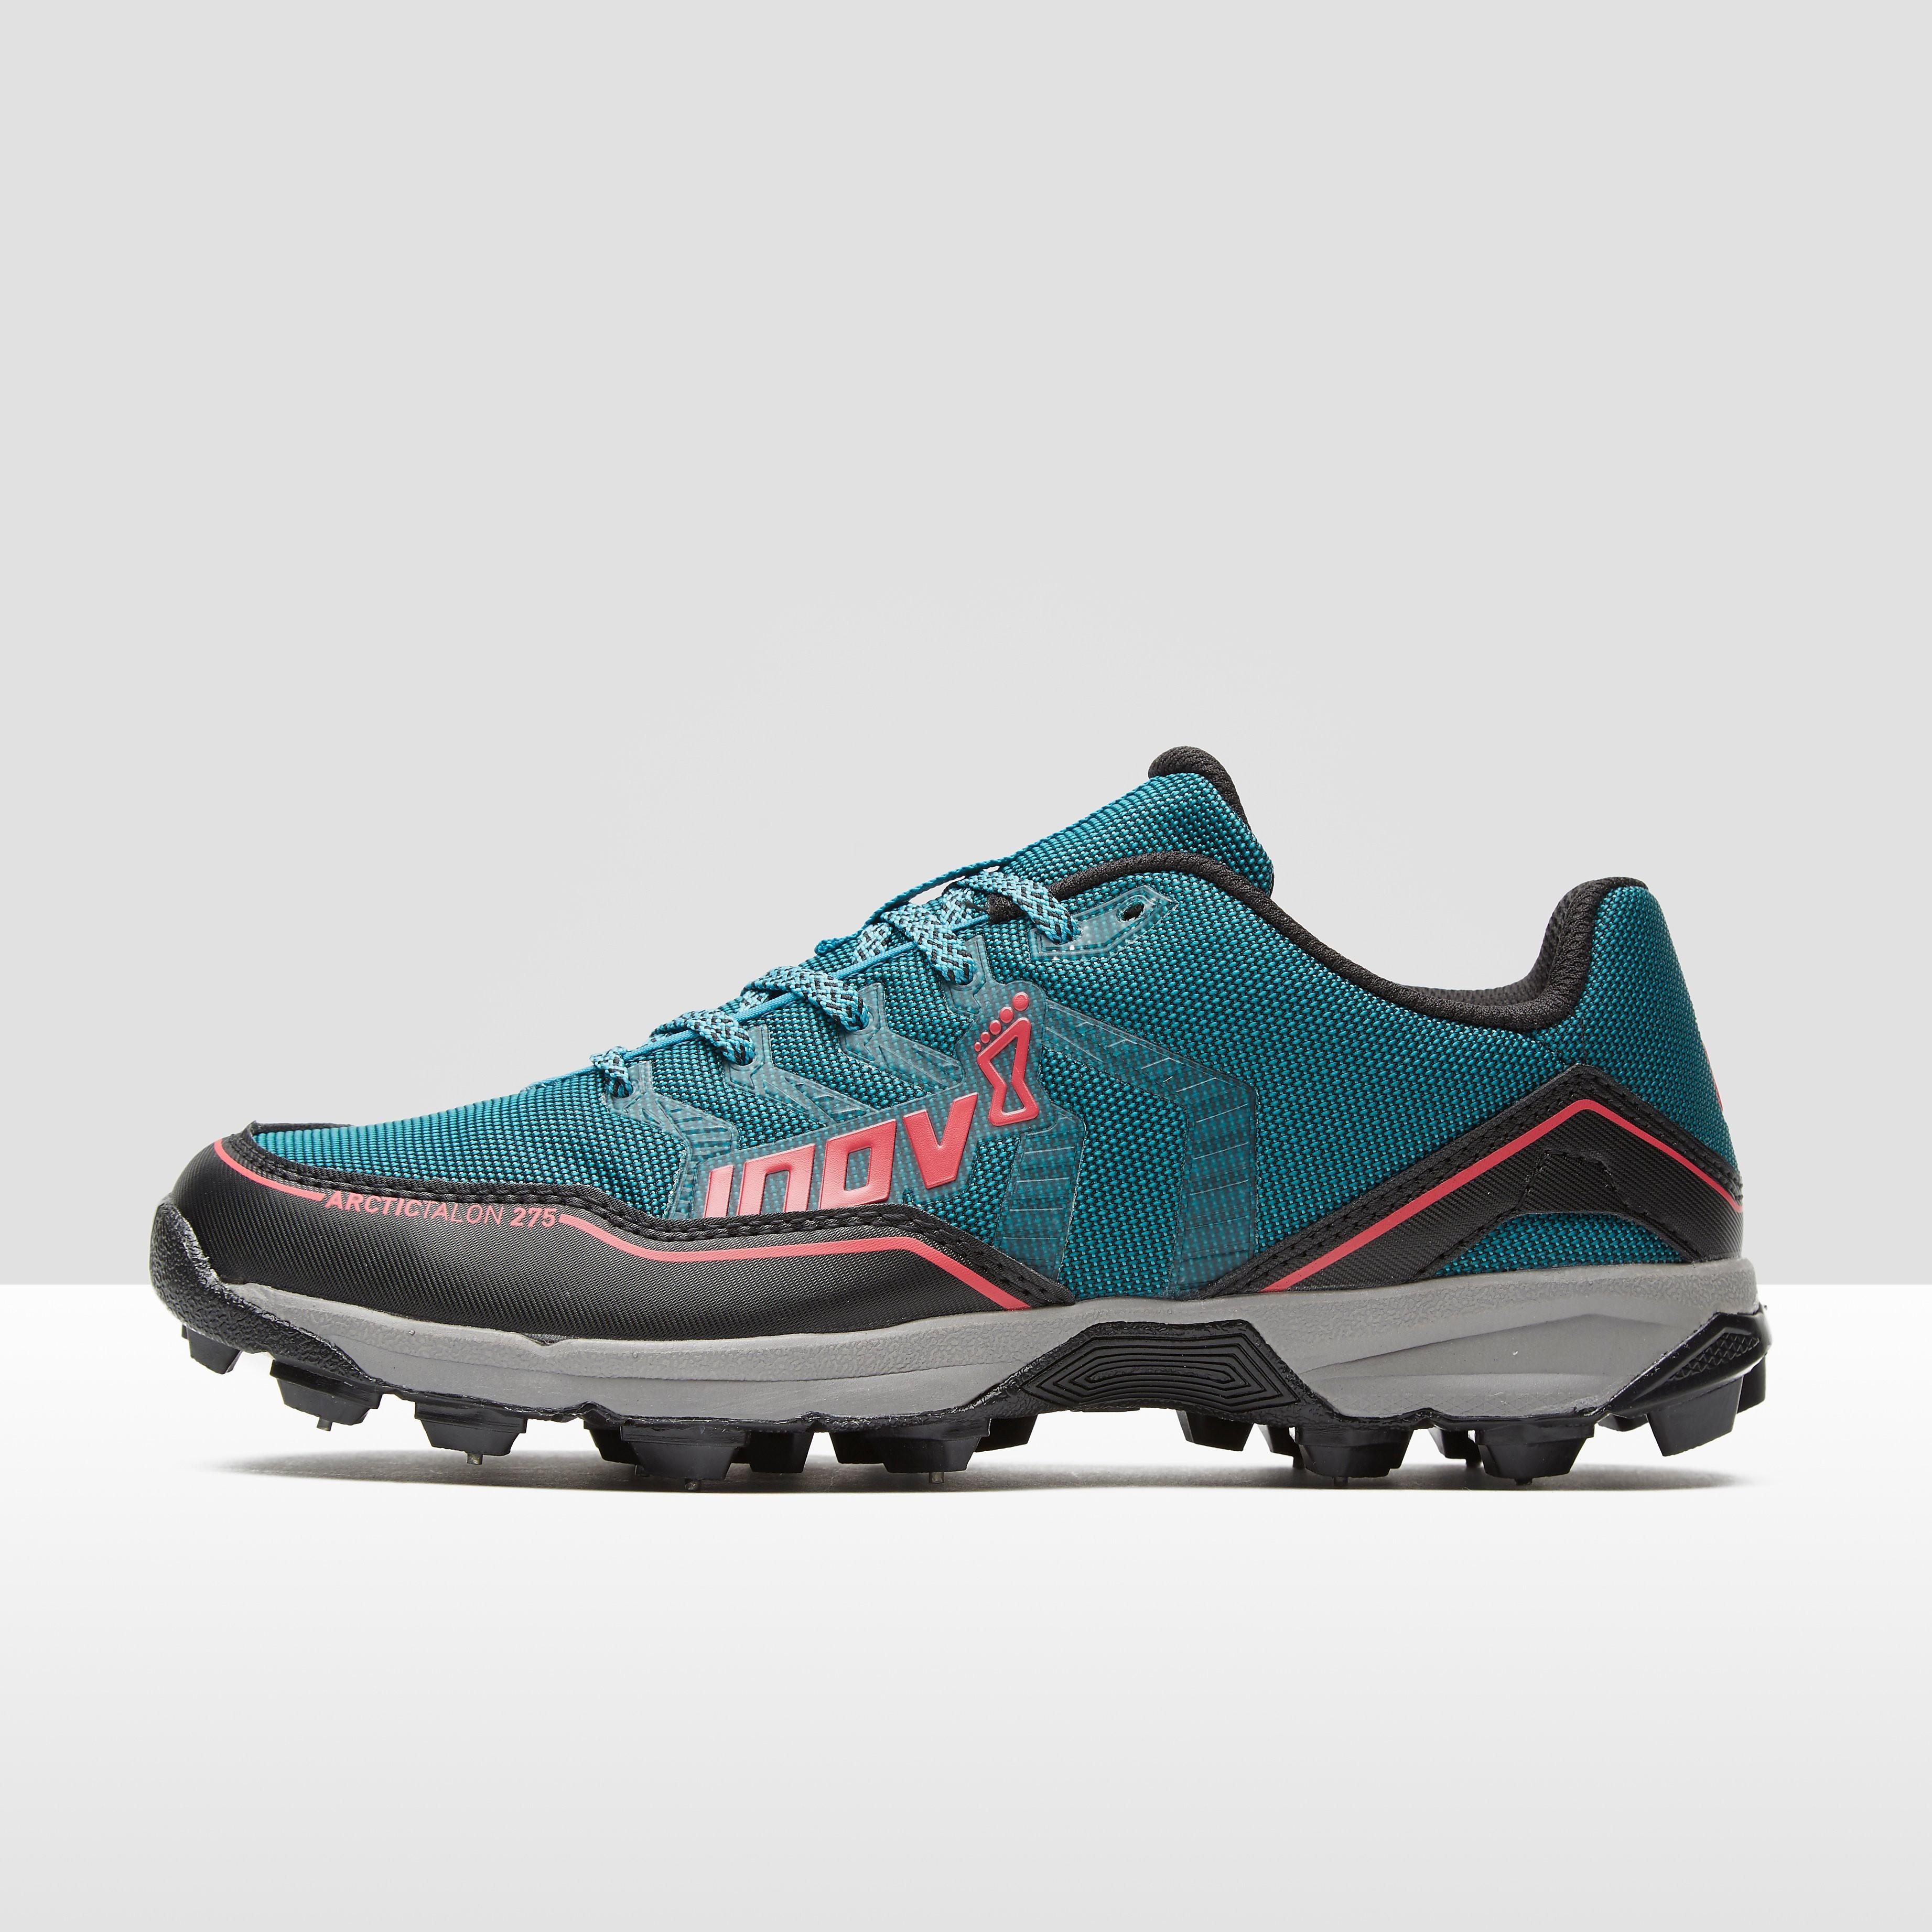 Inov-8 Arctictalon 275 Women's Trail Running Shoes